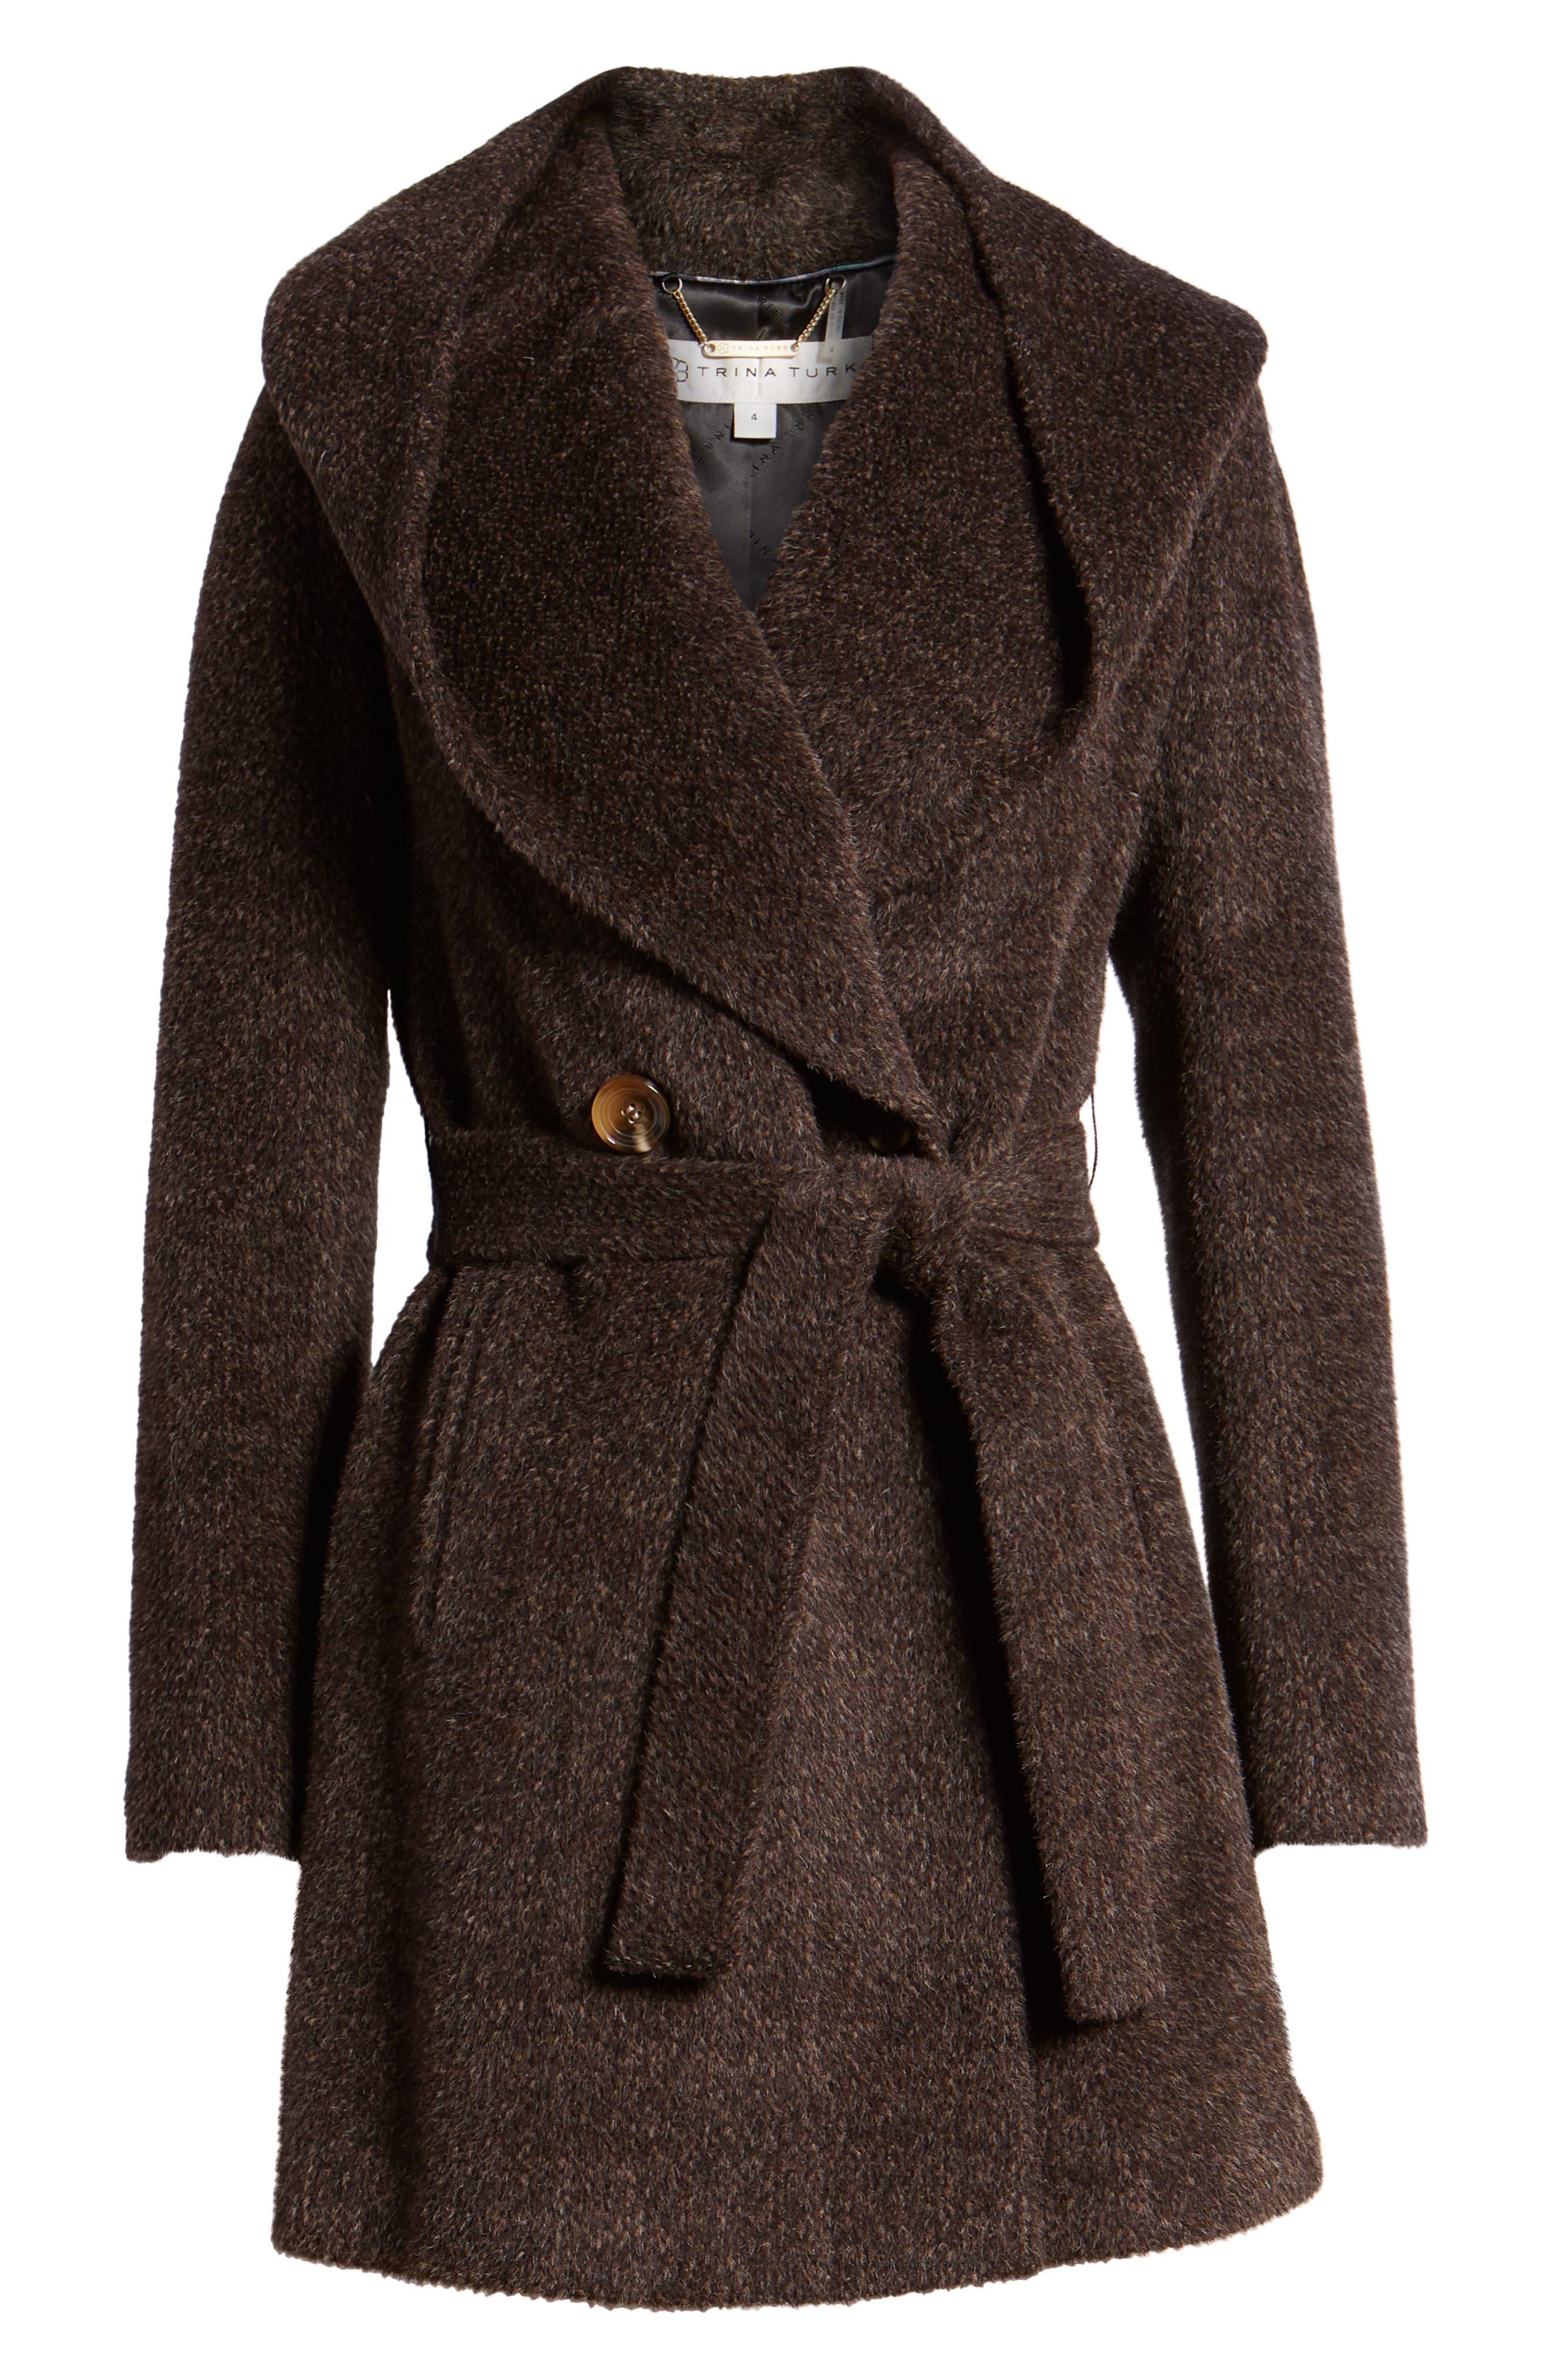 Grace Hooded Wrap Walker Coat,                             Alternate thumbnail 6, color,                             BROWN/ BLACK